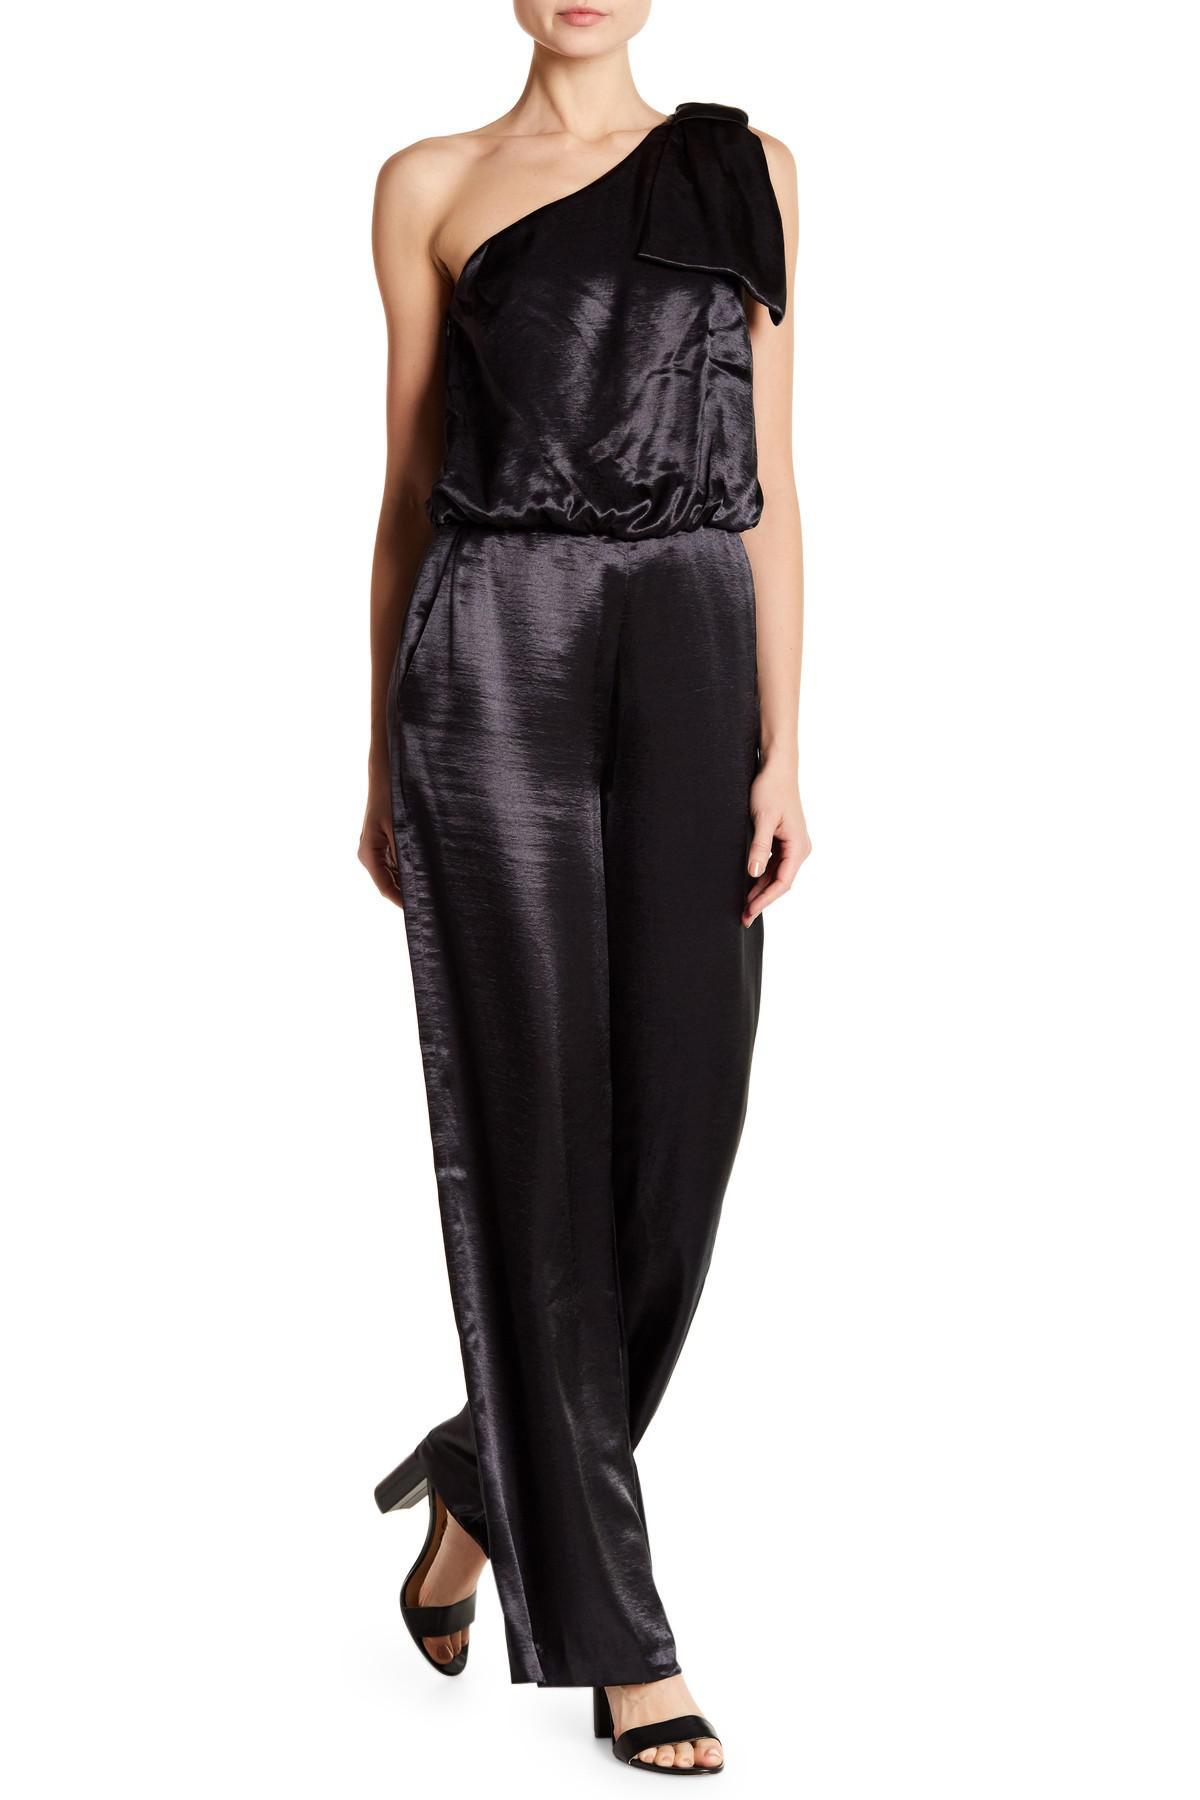 18f08c6ce81b Lyst - RACHEL Rachel Roy Noir Jumpsuit in Black